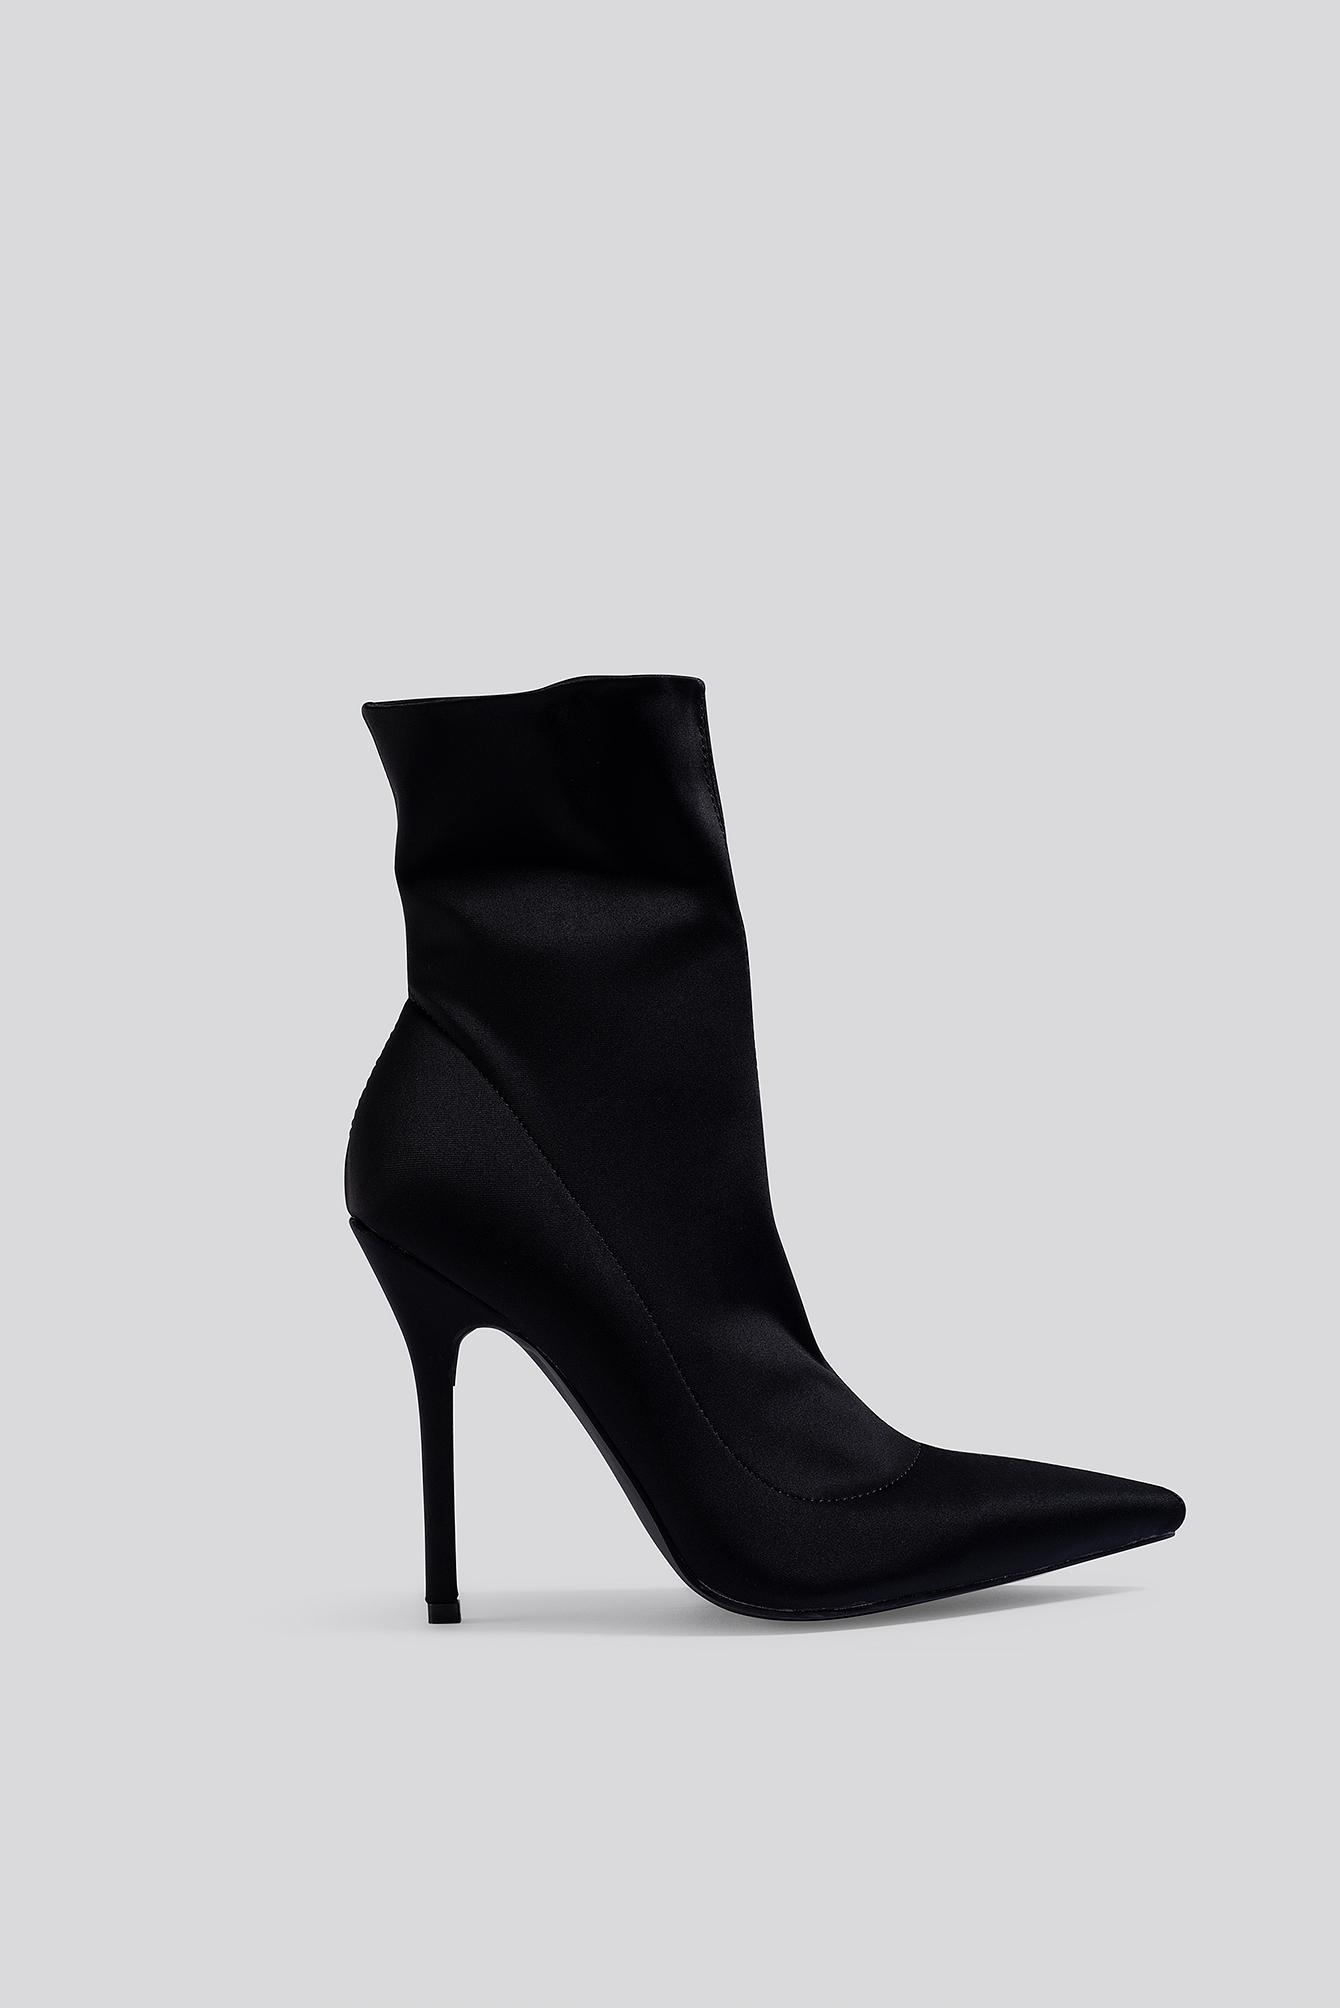 raid -  Presca Ankle Boots - Black